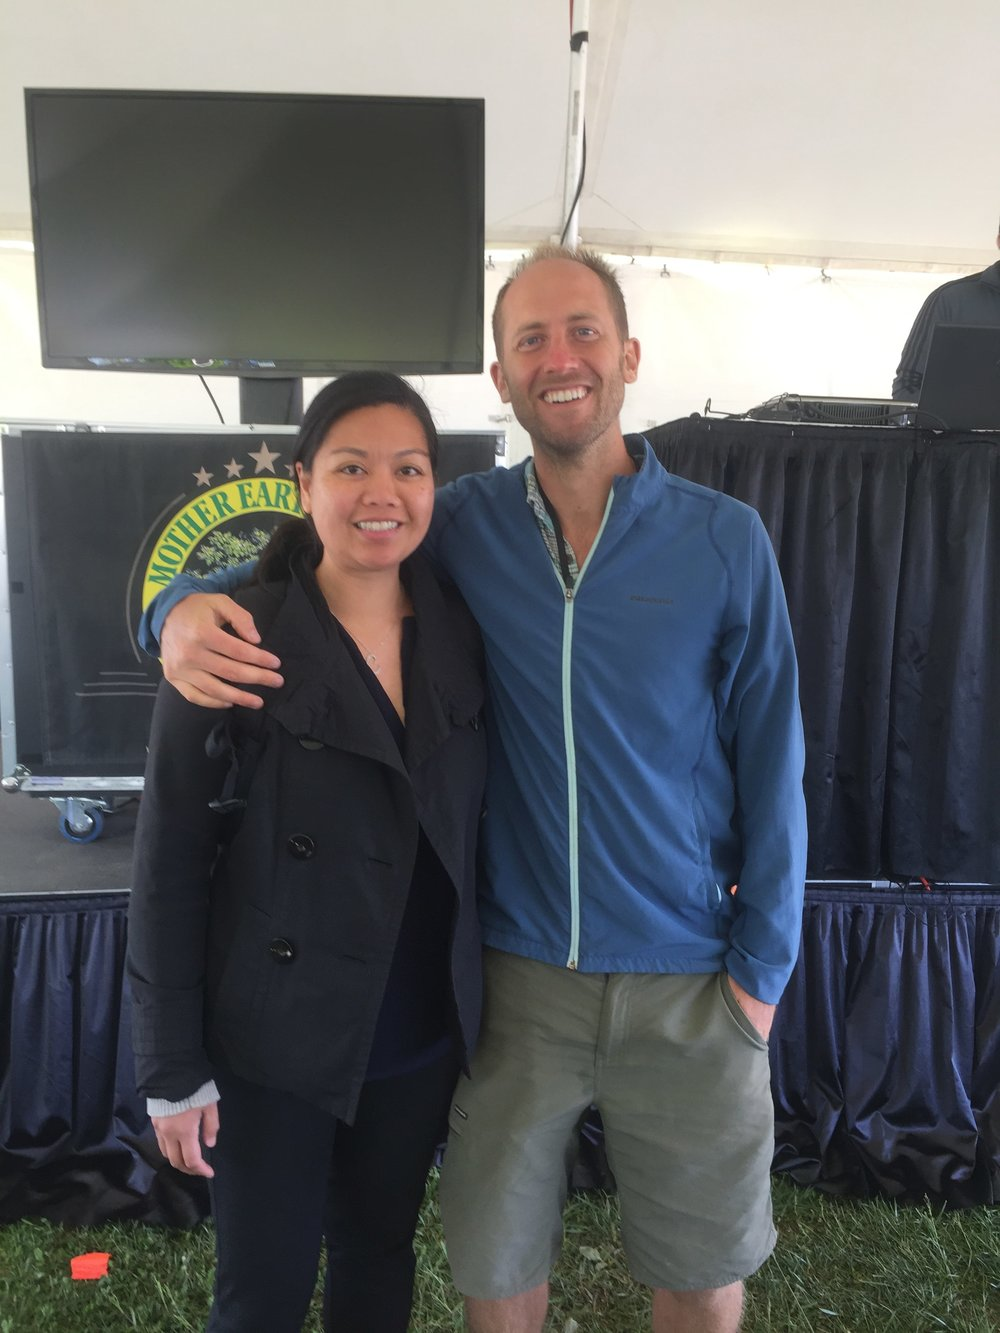 Met environmental warrior and activist Rob Greenfield.